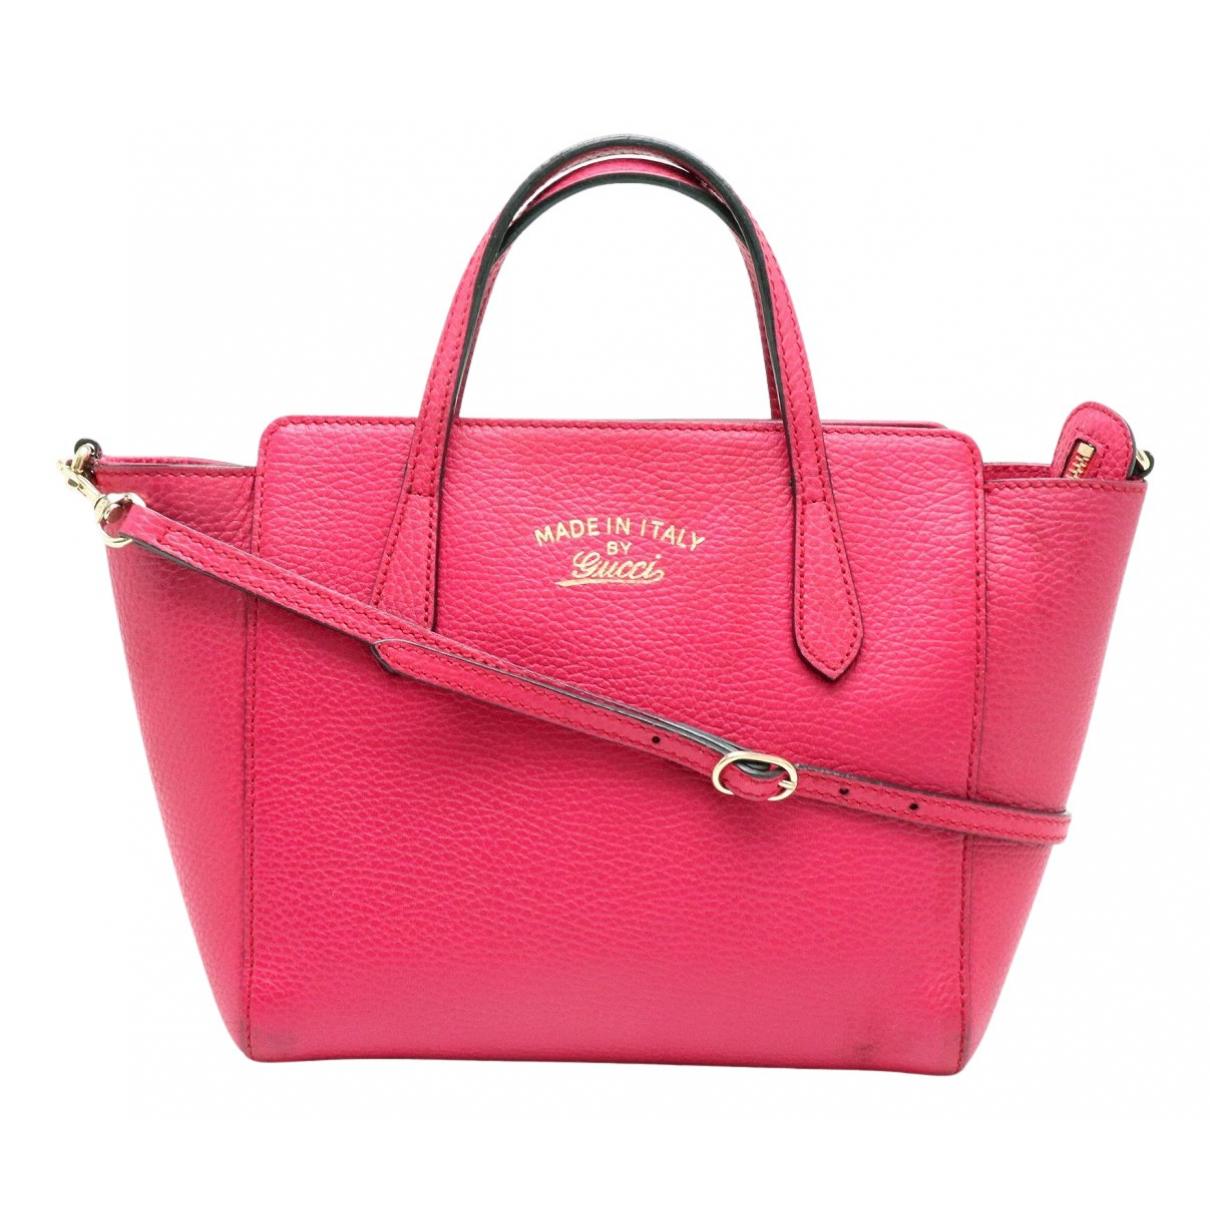 Gucci Swing Pink Leather handbag for Women N